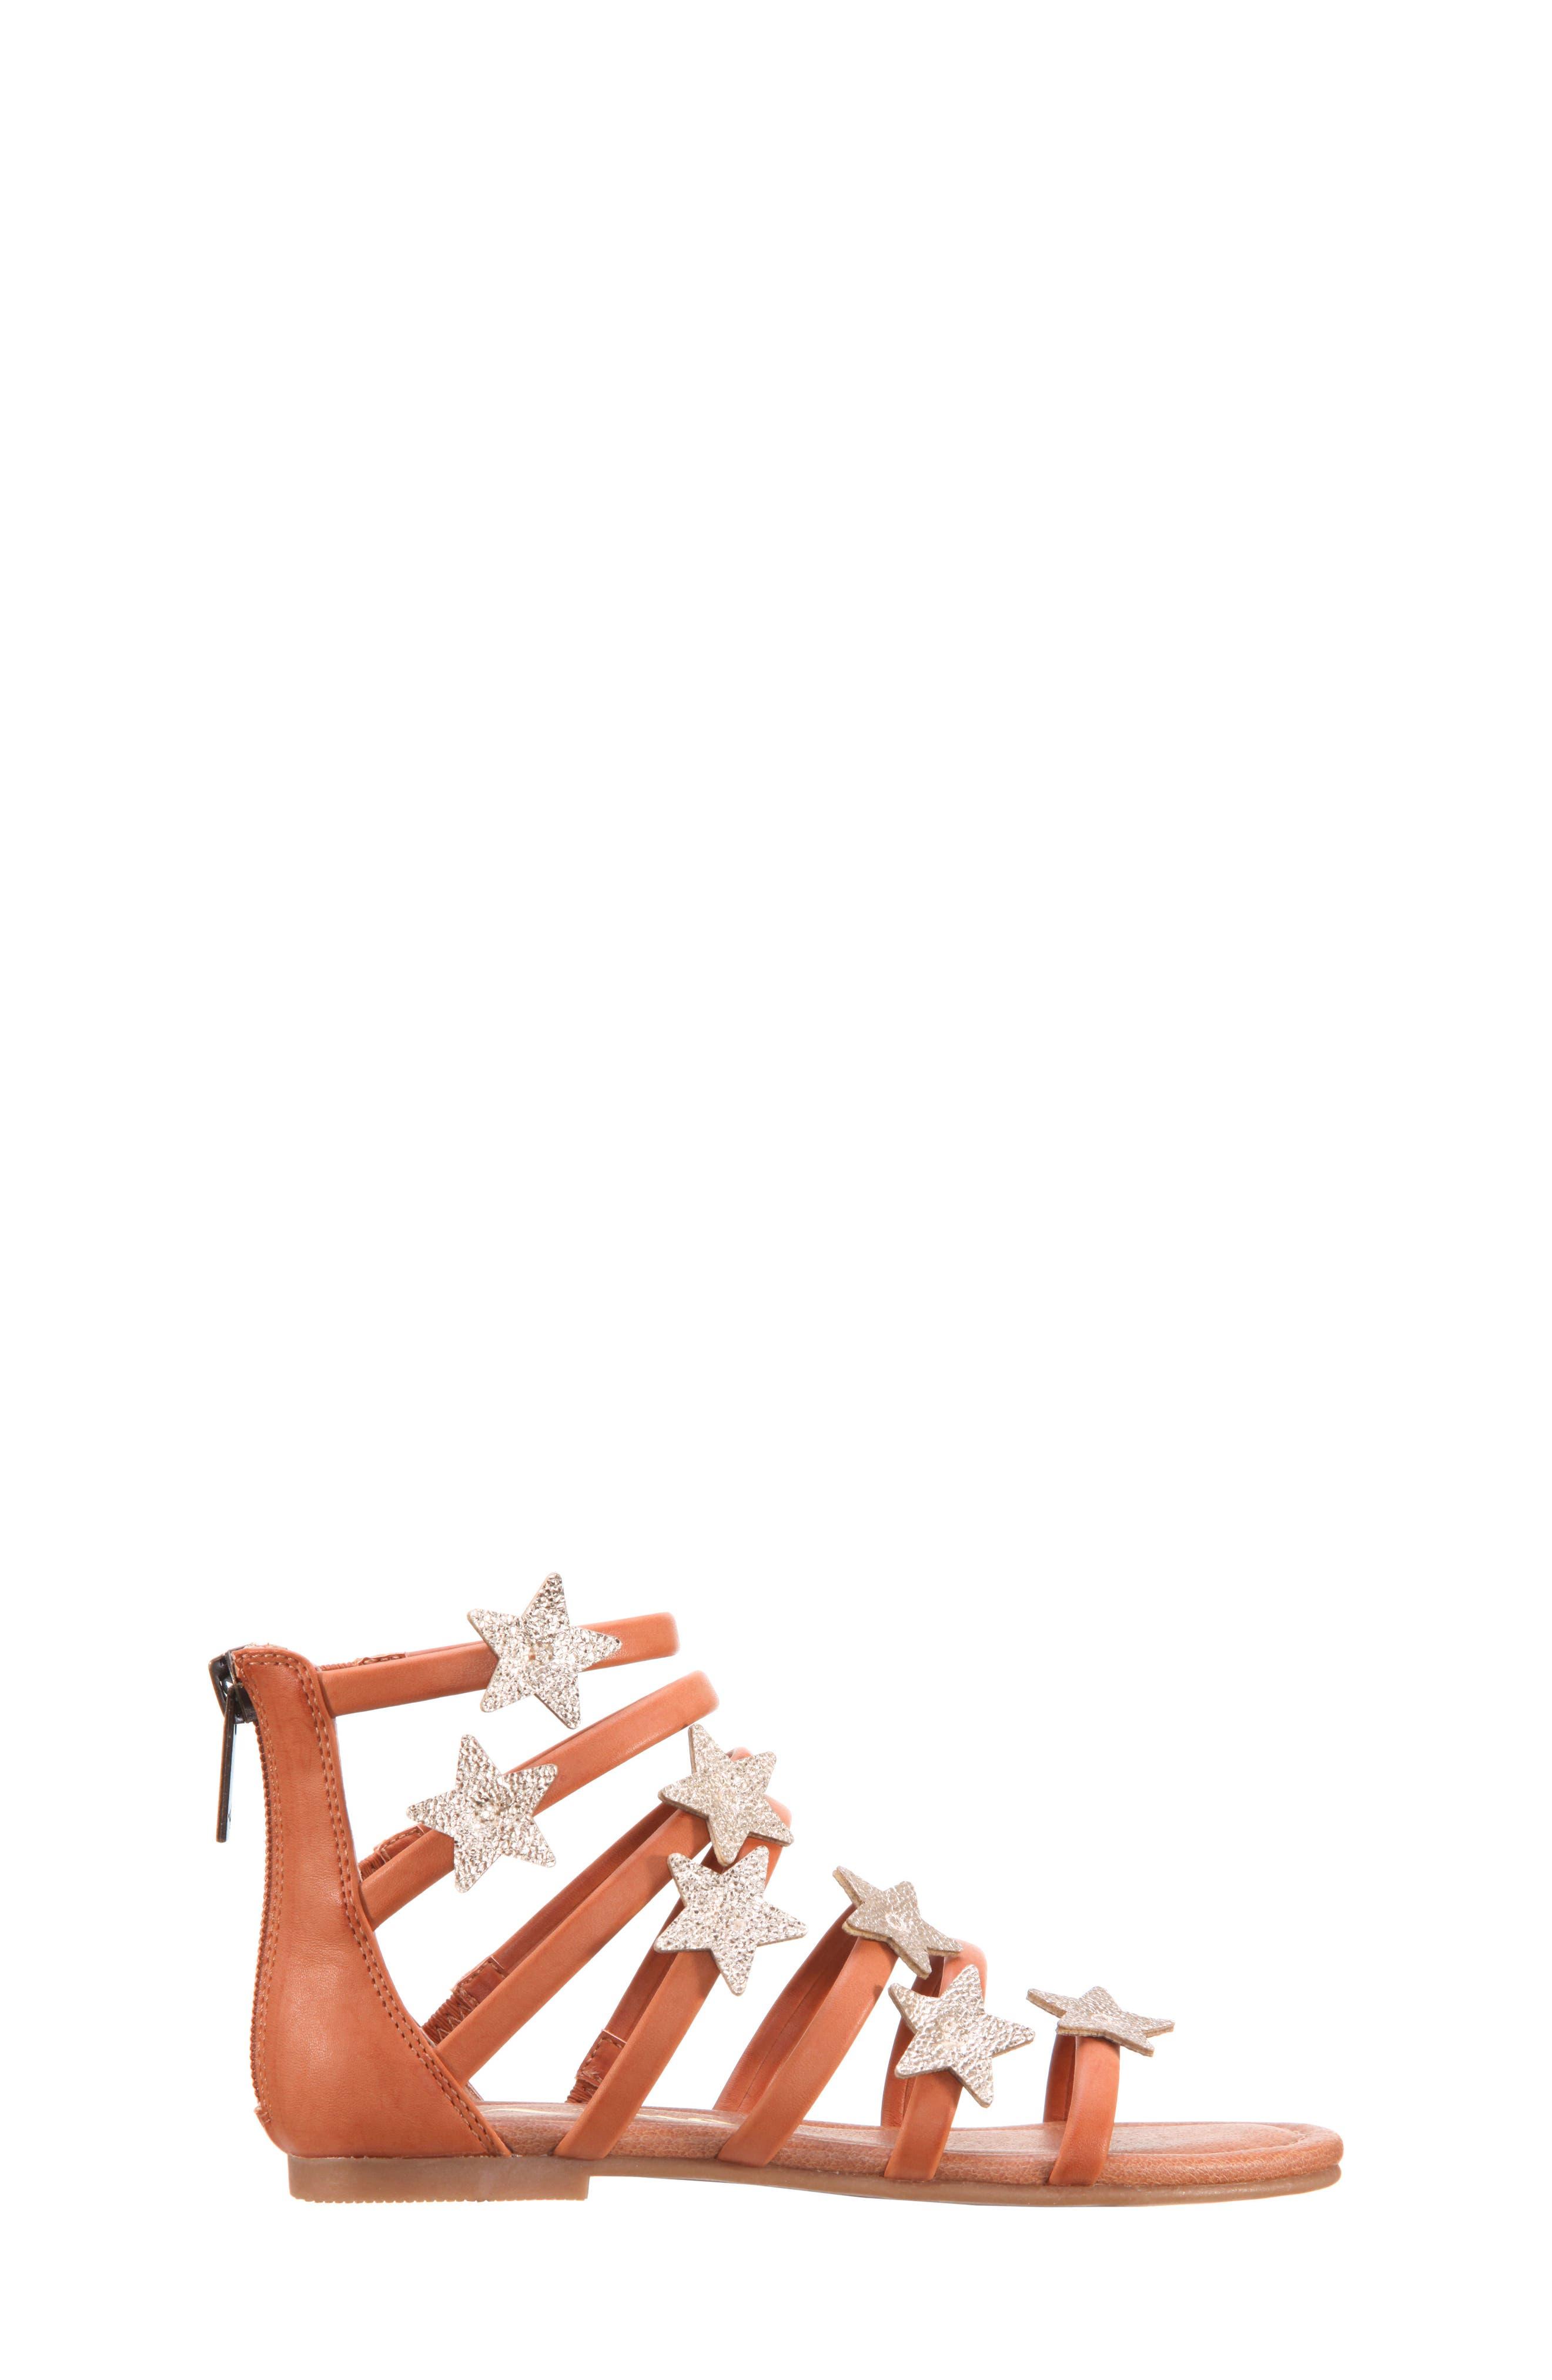 Robertha Gladiator Sandal,                             Alternate thumbnail 3, color,                             710